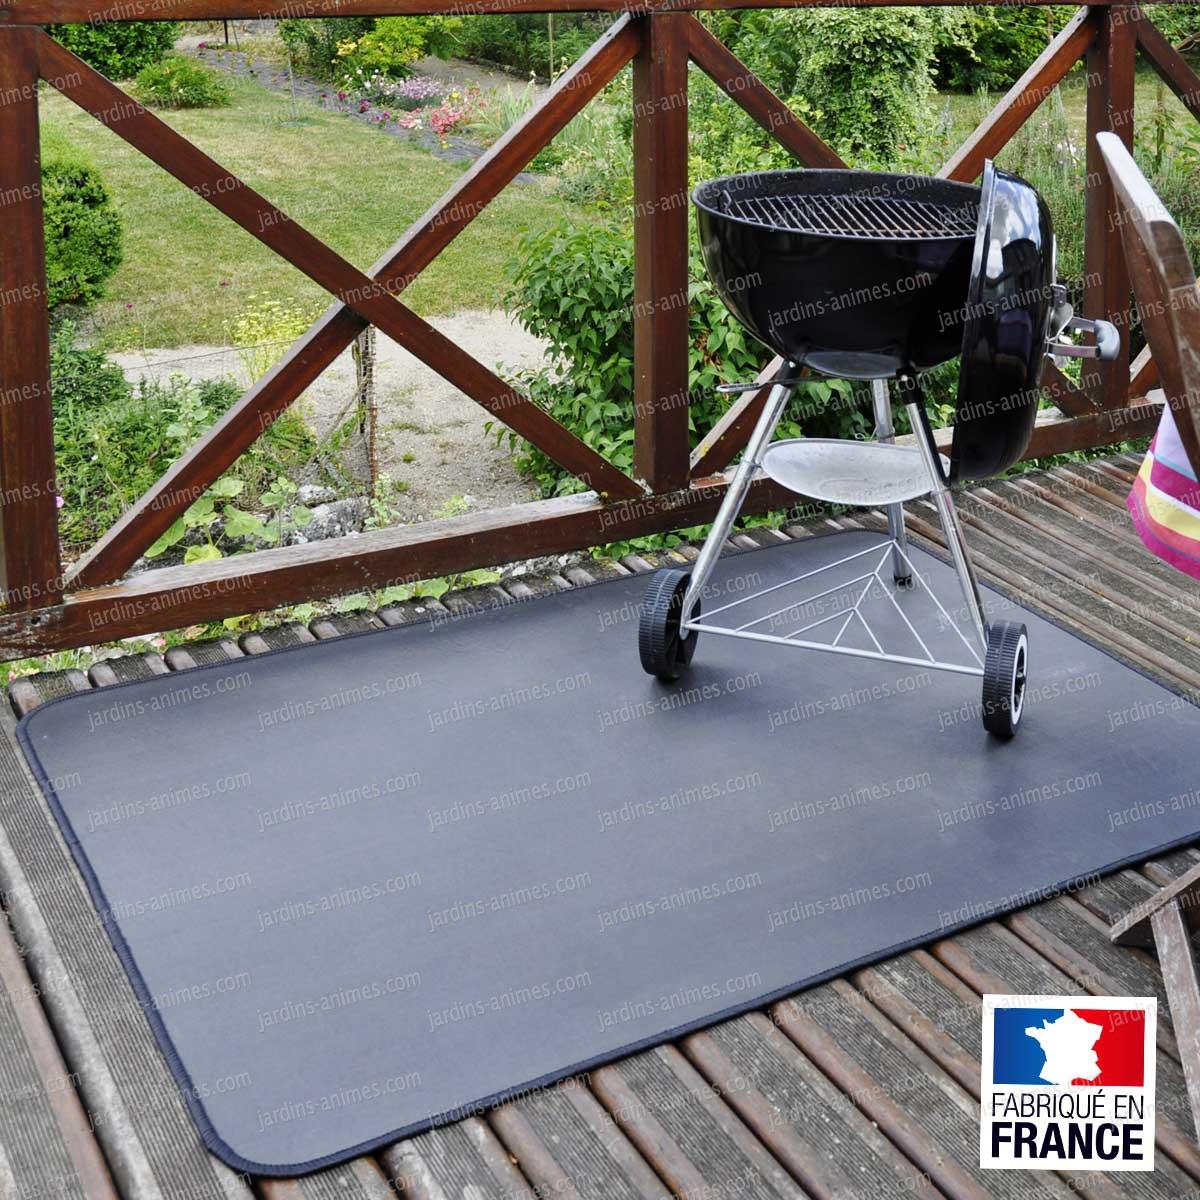 Tapis Pour Barbecue Castorama Enredada